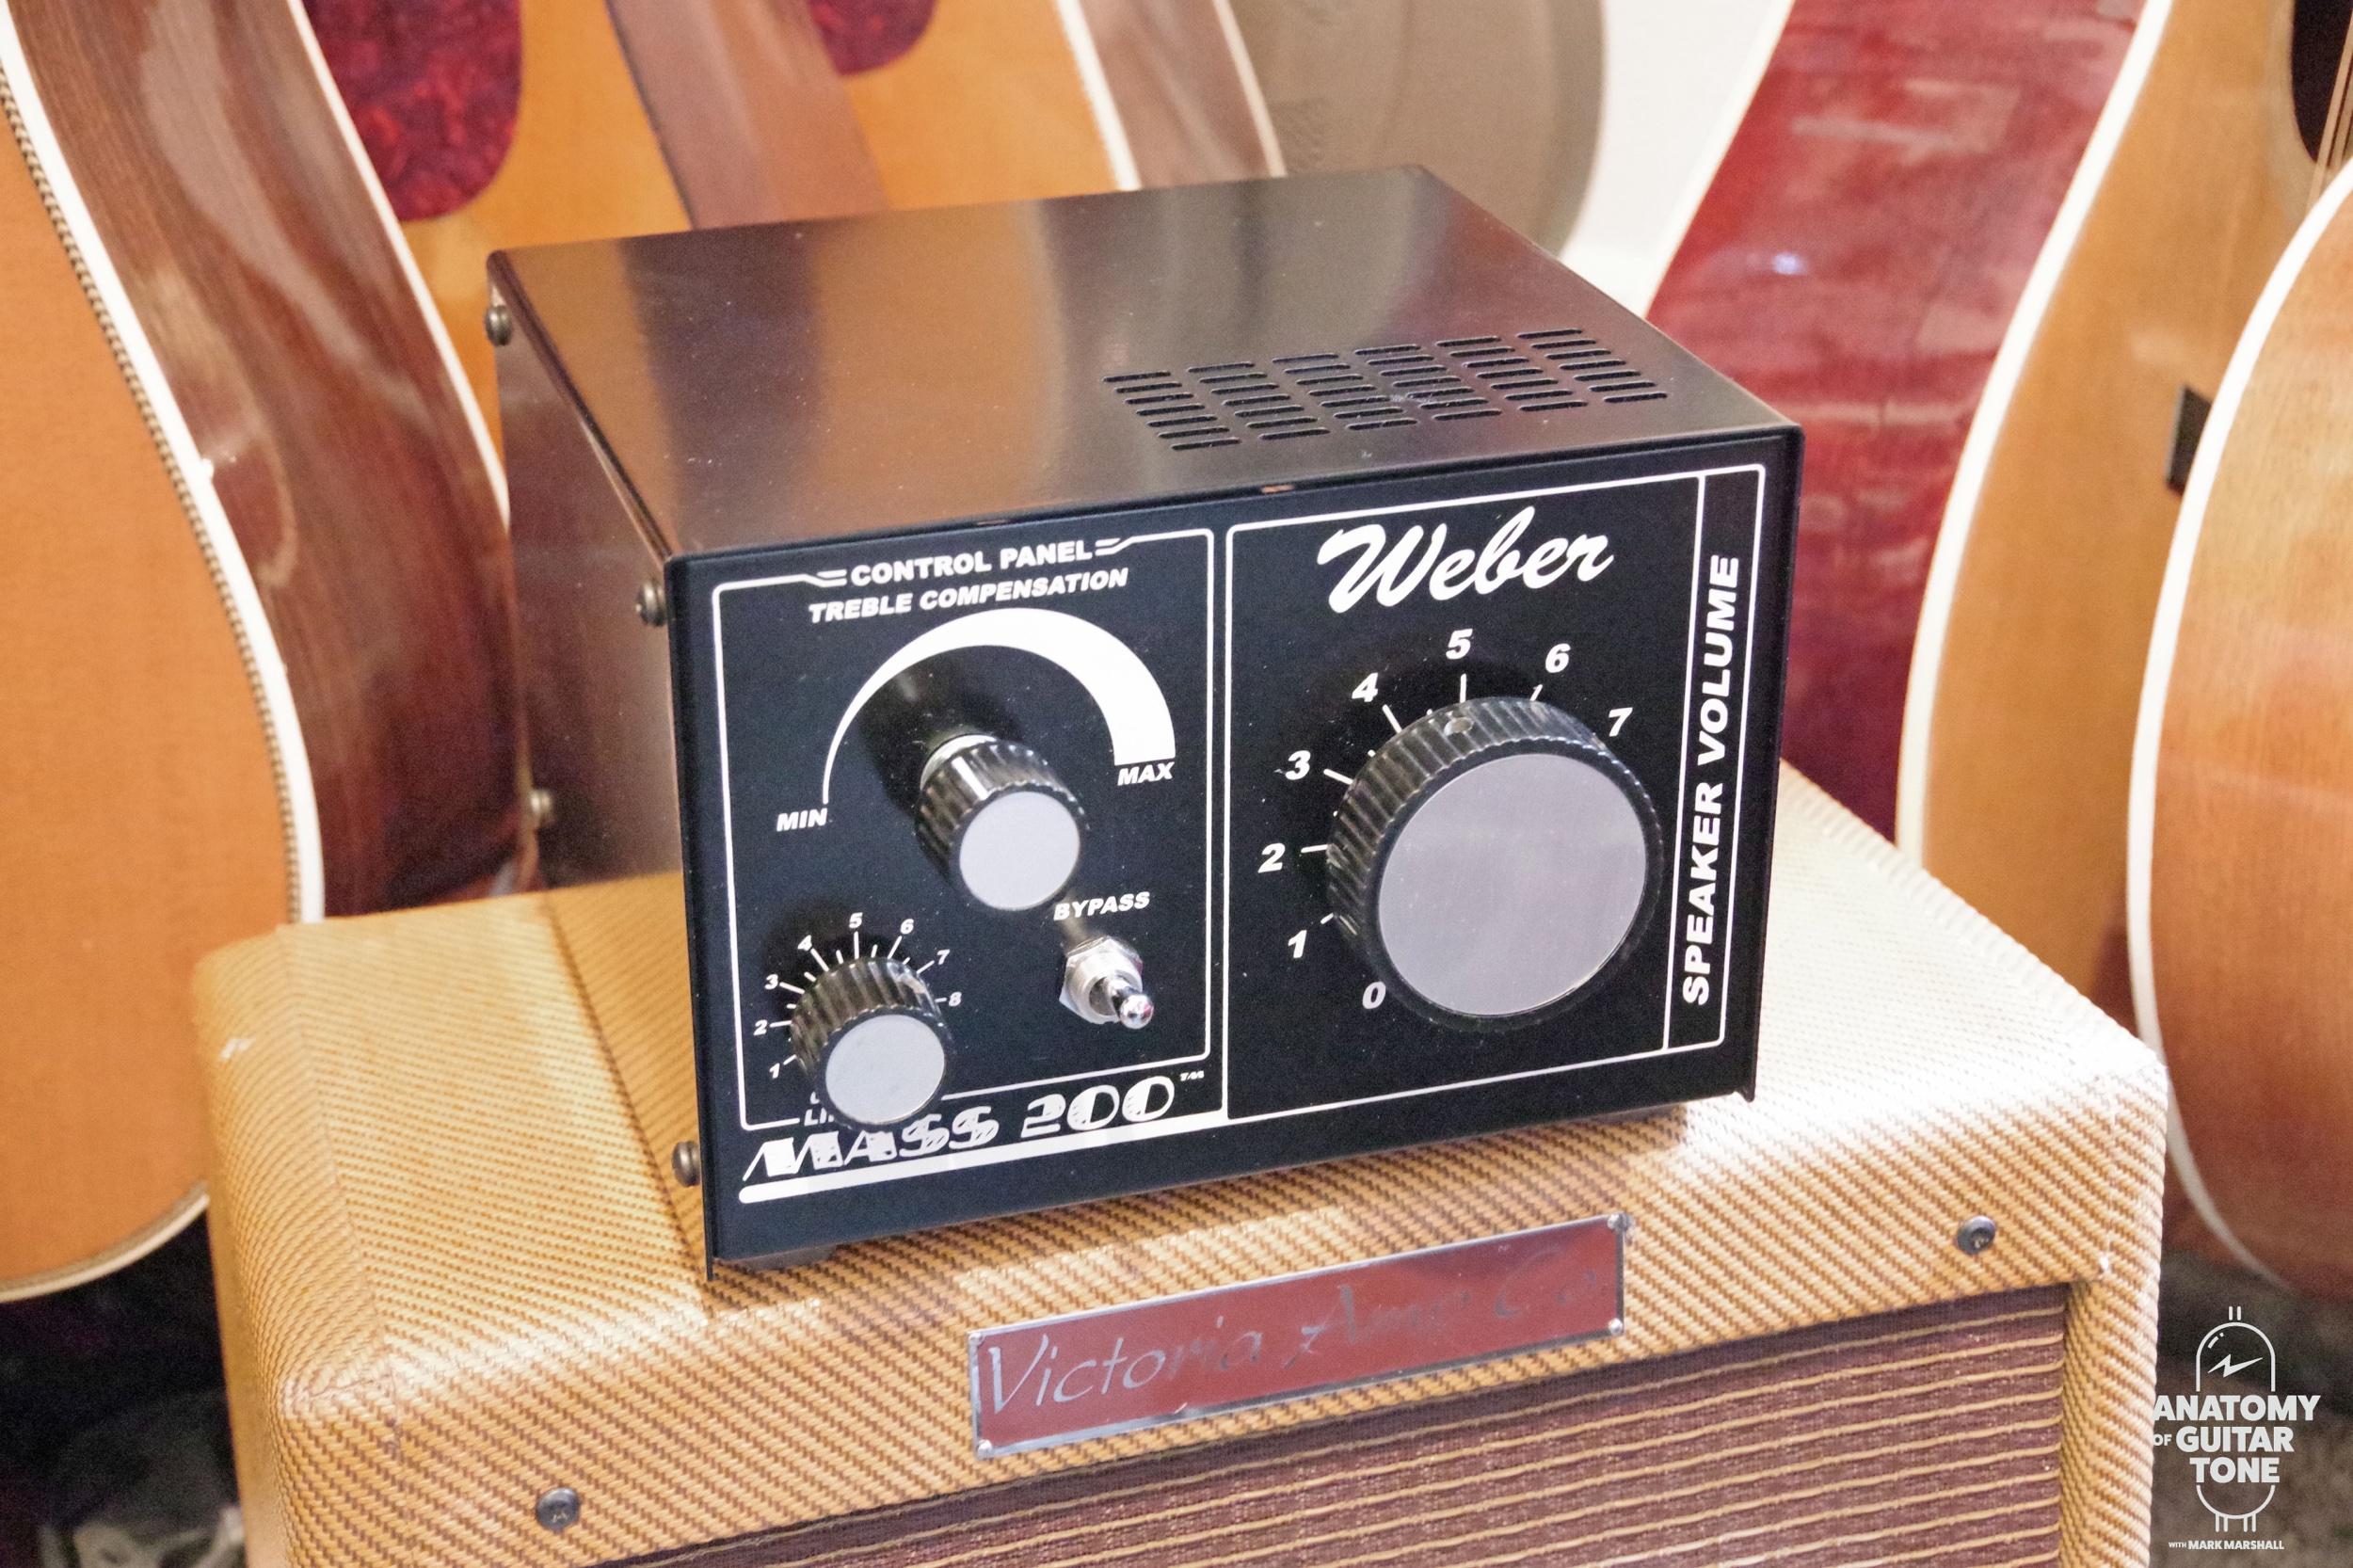 Weber Mass 200 attenuator and a Victoria 518 amp